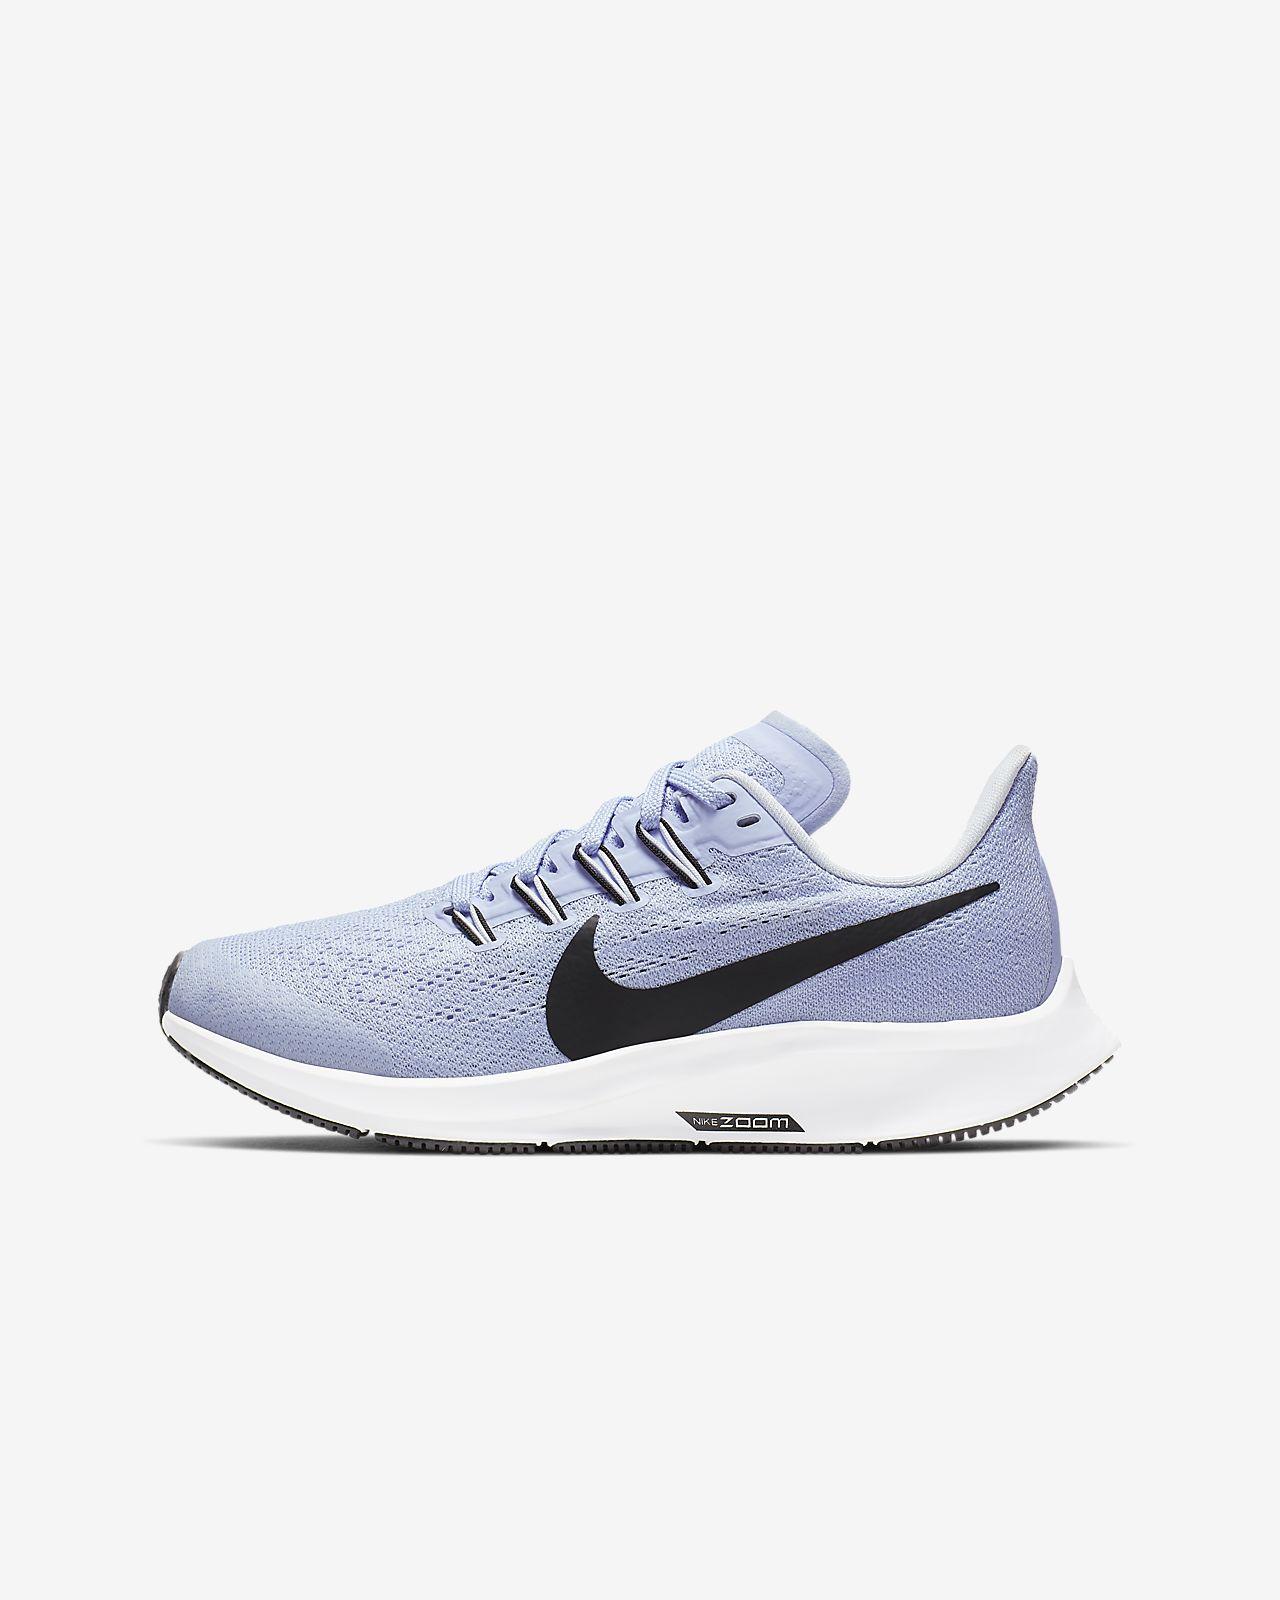 Nike Air Zoom Pegasus 36 futócipő gyerekeknek/nagyobb gyerekeknek